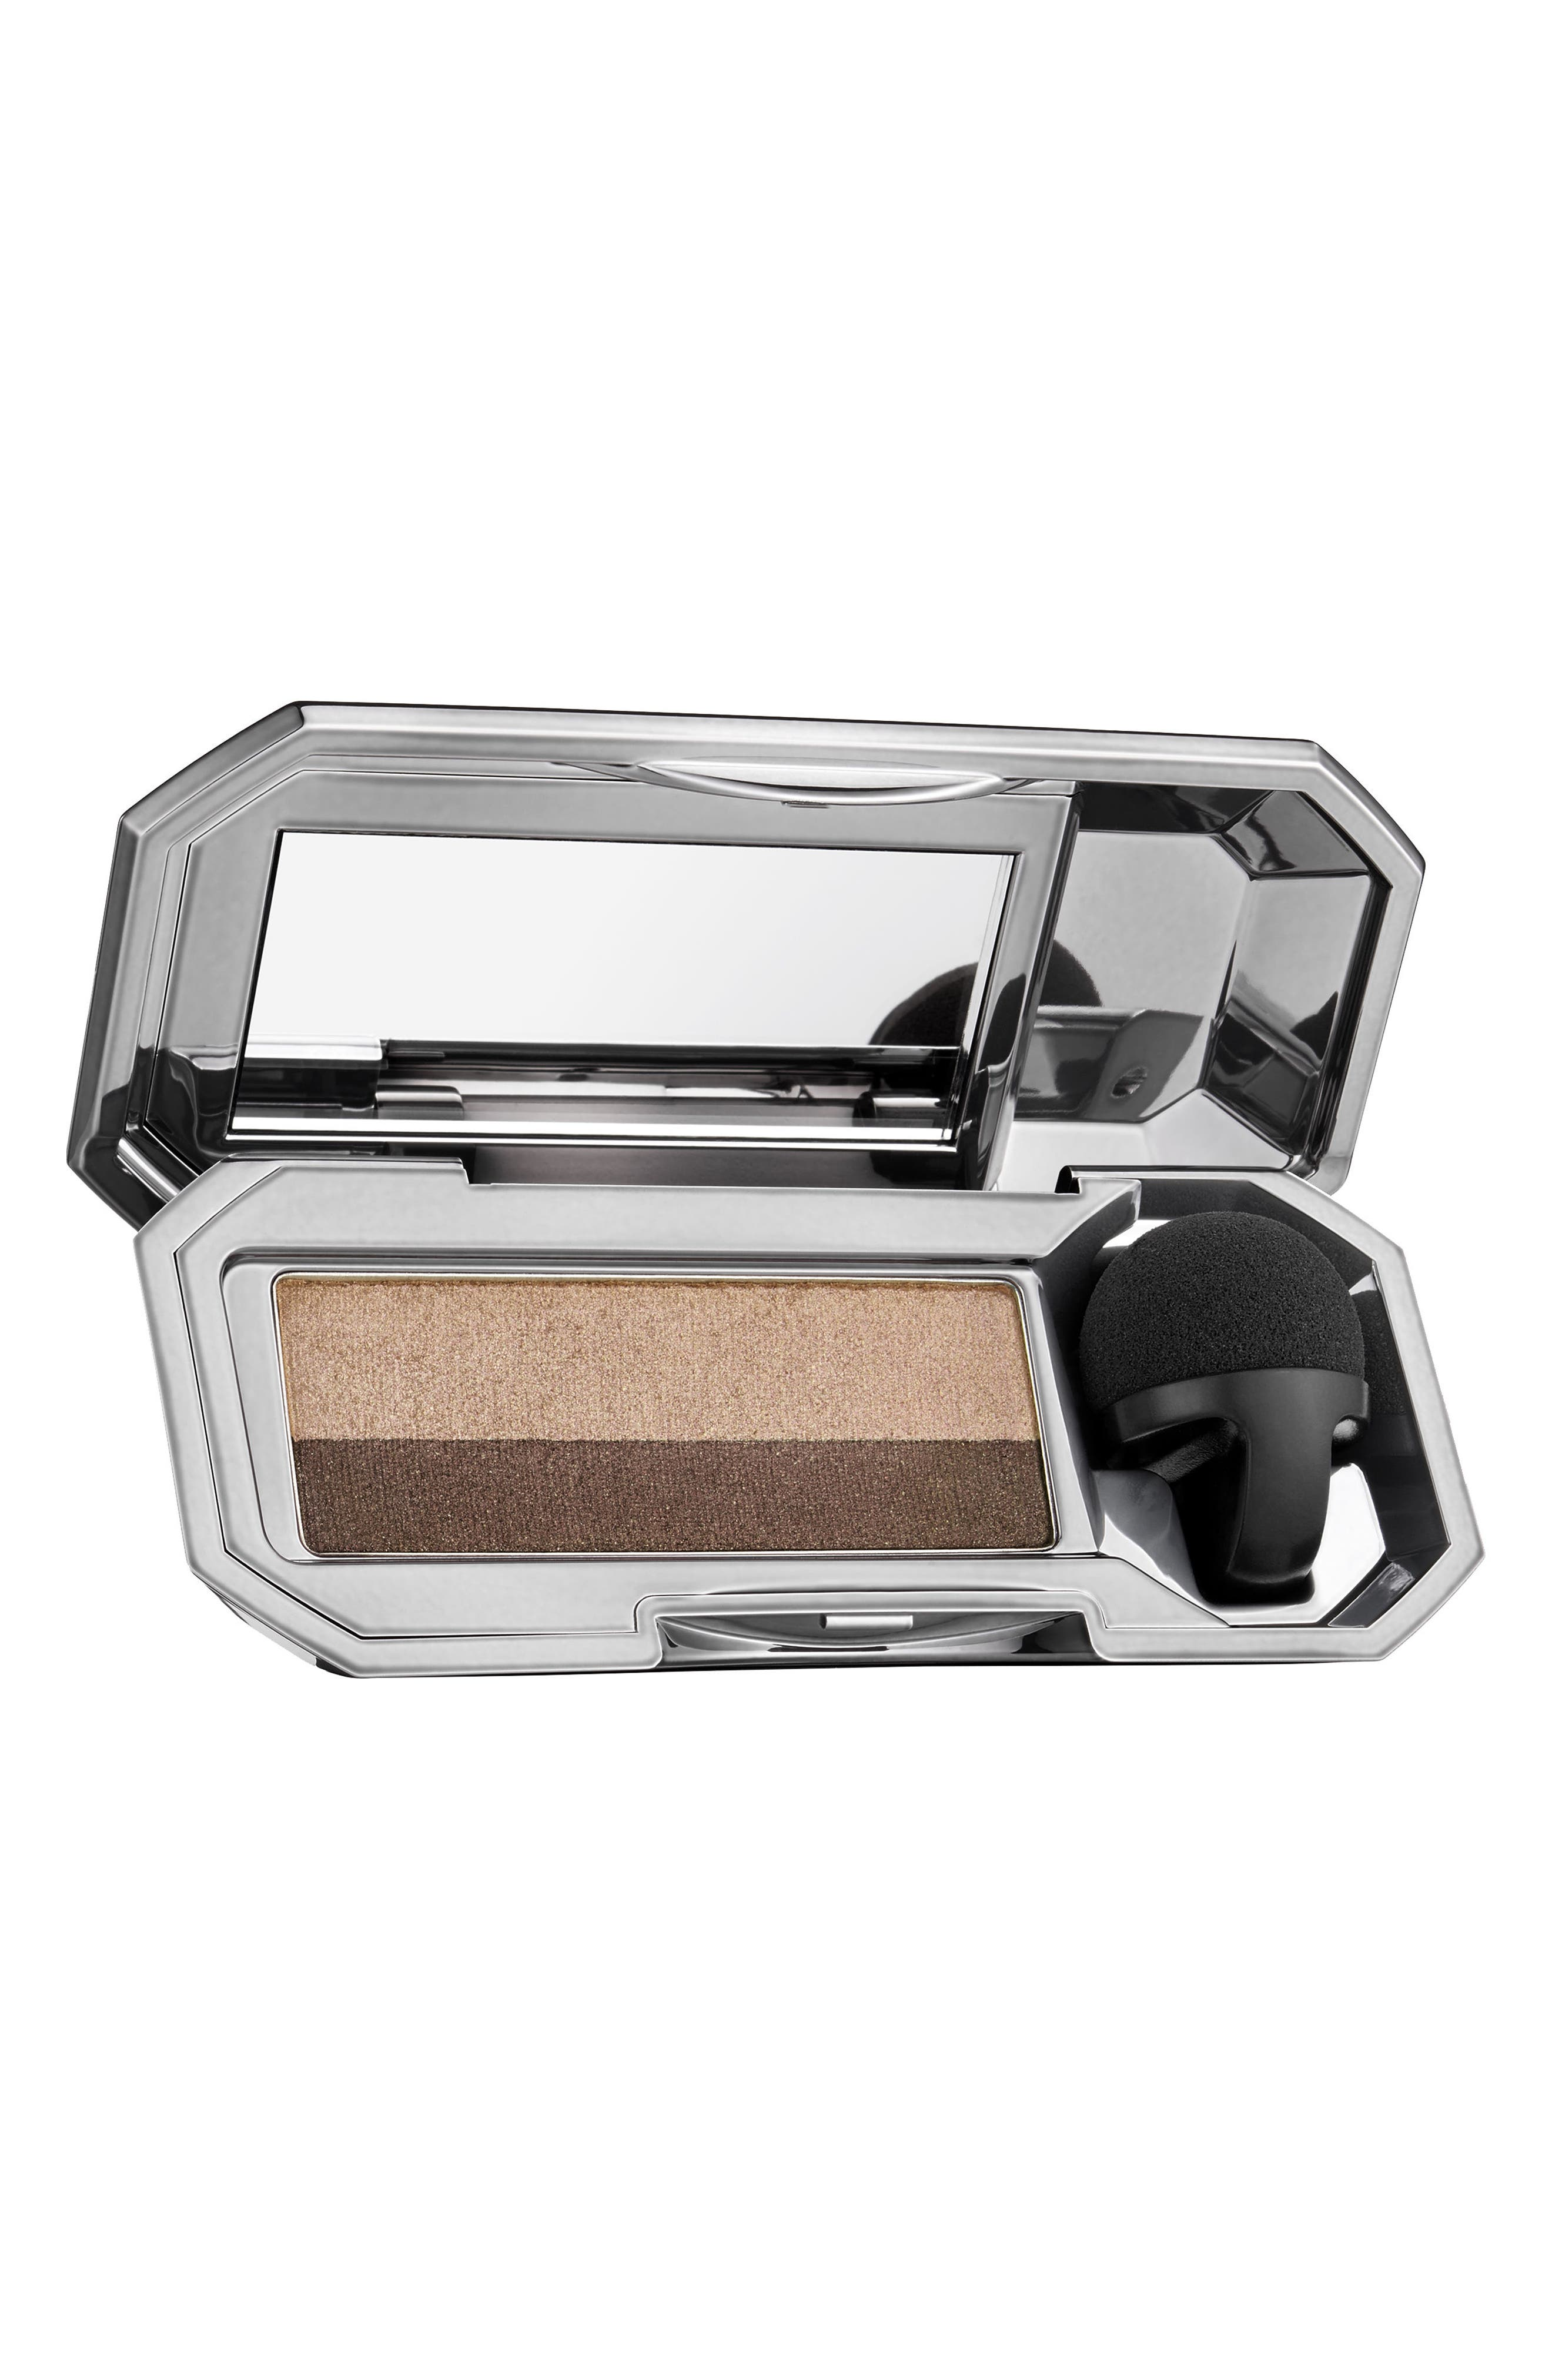 Main Image - Benefit They're Real! Eyeshadow Blender & Beyond Easy Eyeshadow Duo